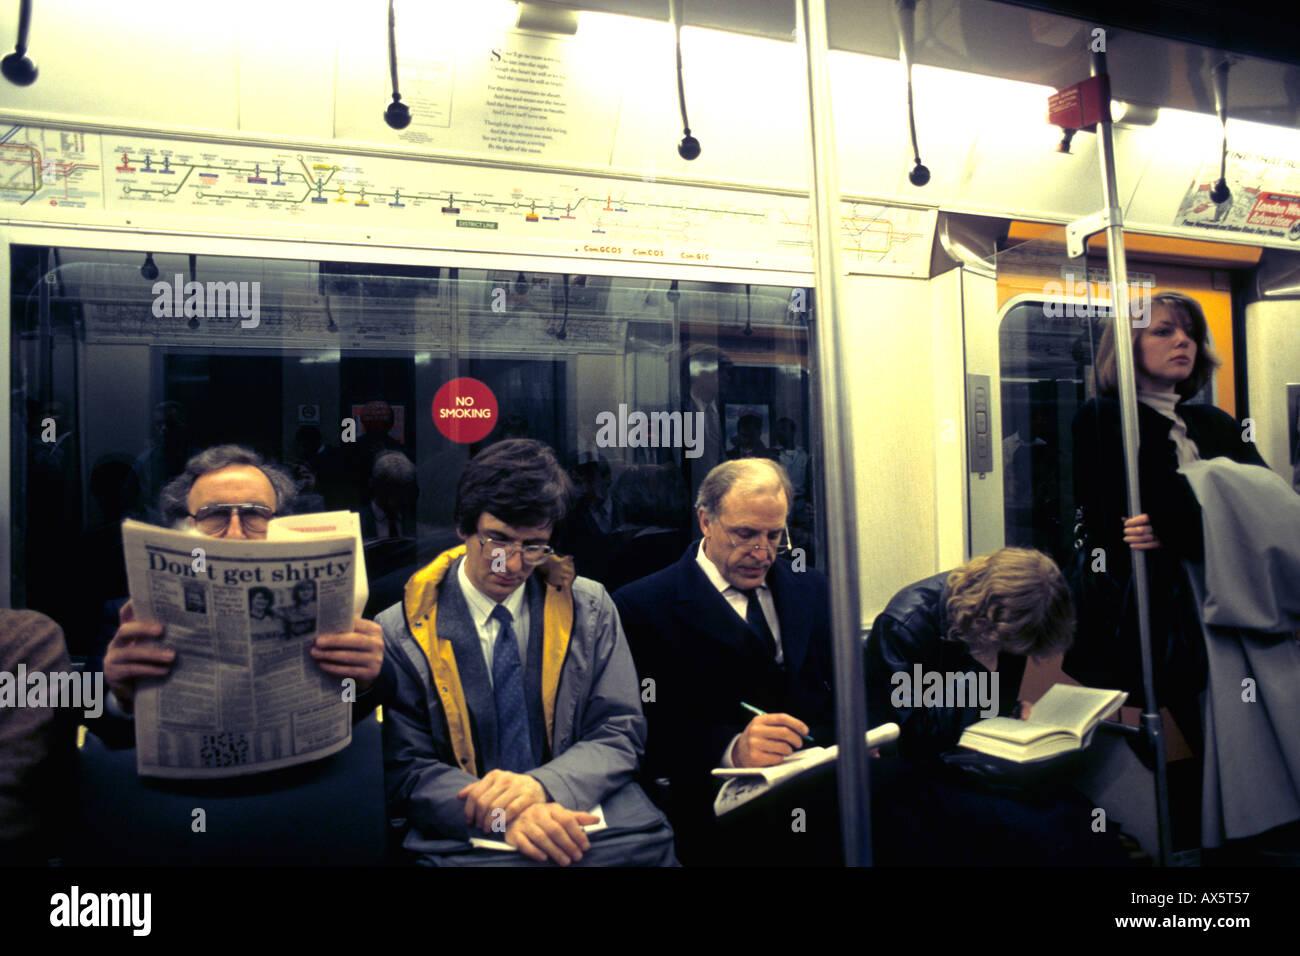 The Tube underground mass transit system in London England - Stock Image